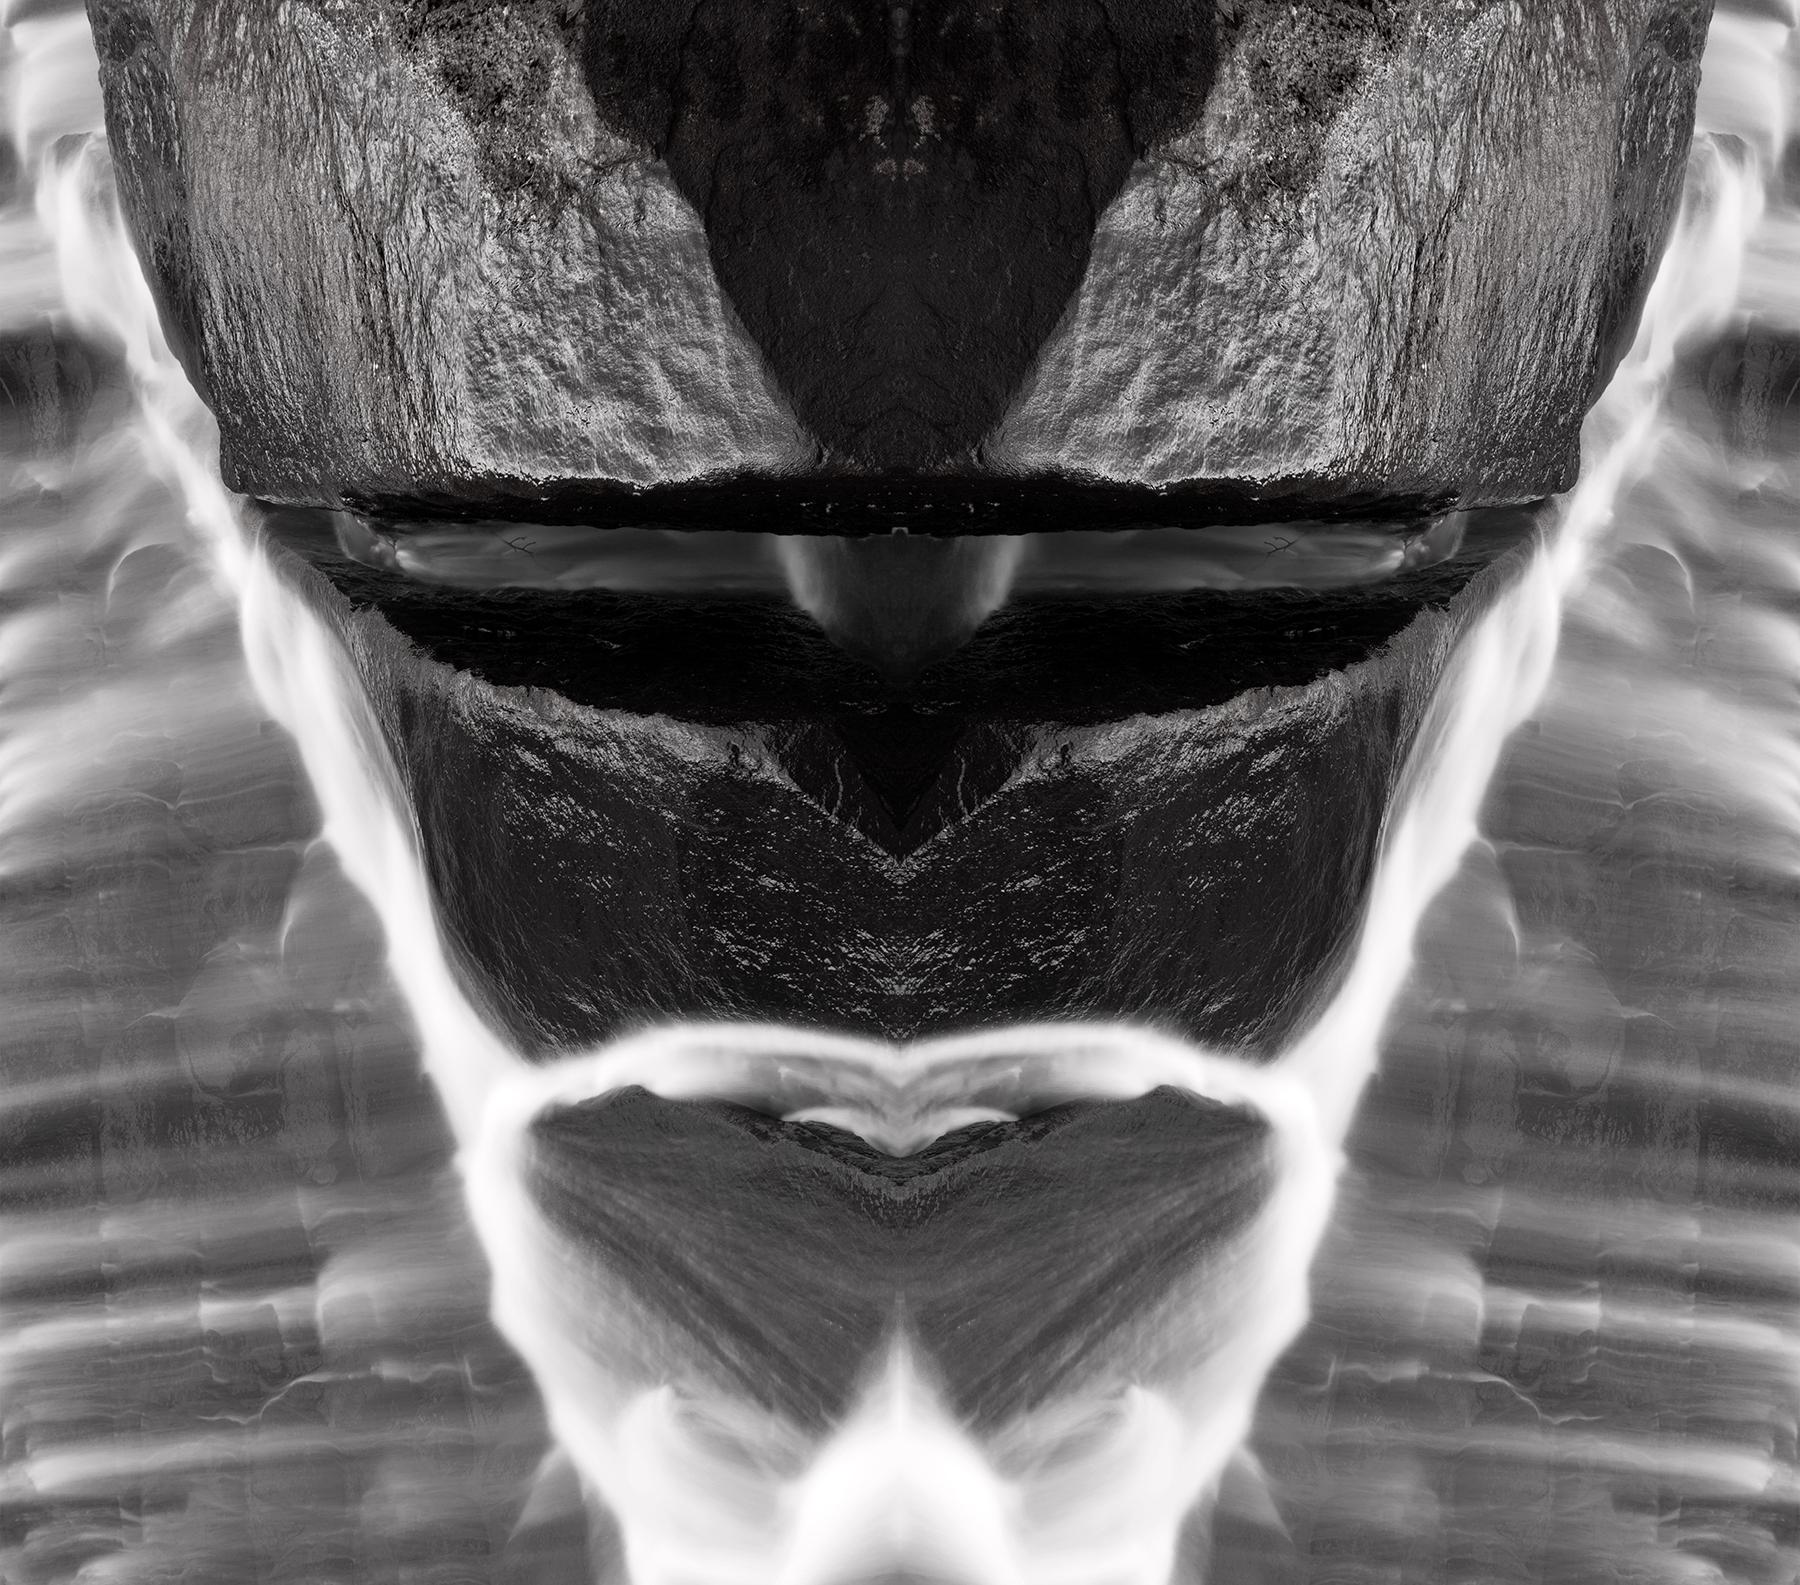 Alien Tribal Mask - Black & White, Abstract, Nose, Rocks, Rock, HQ Photo